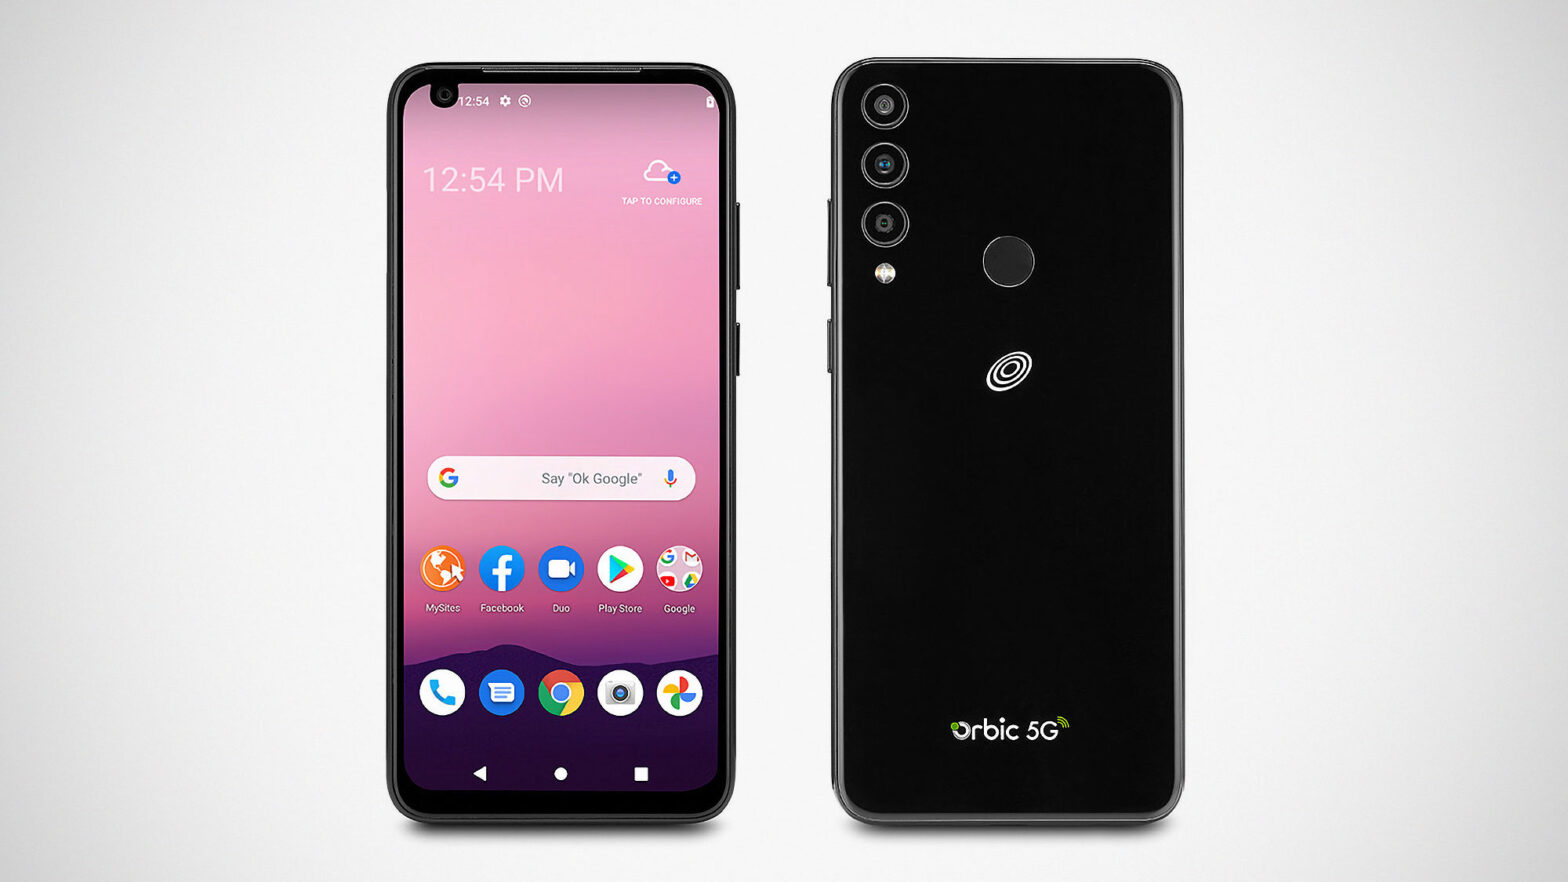 Orbic Magic 5G Smartphone for TracFone